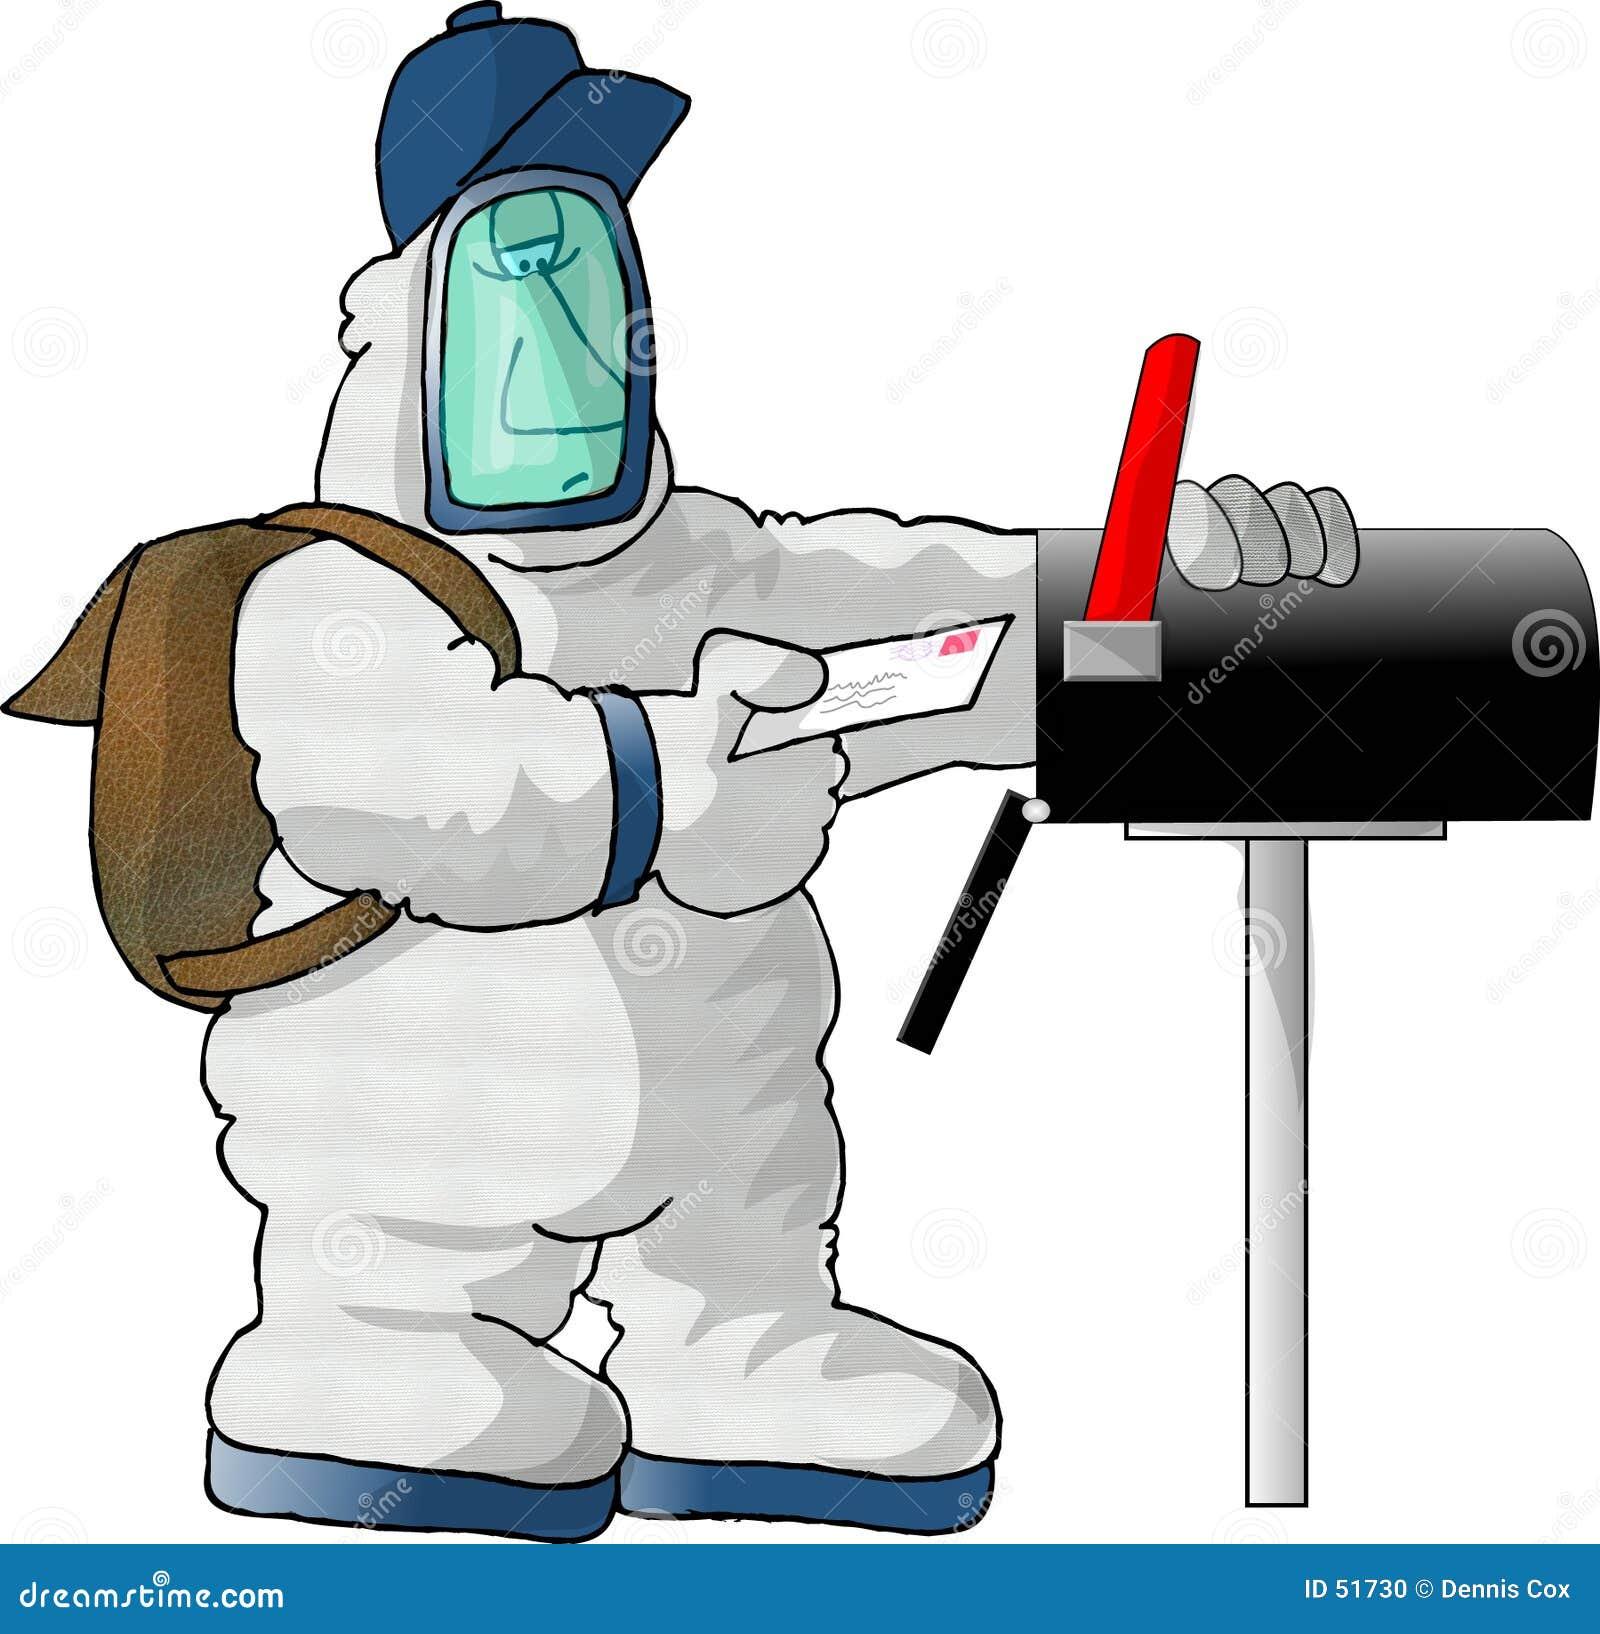 Mailman in the 21st century